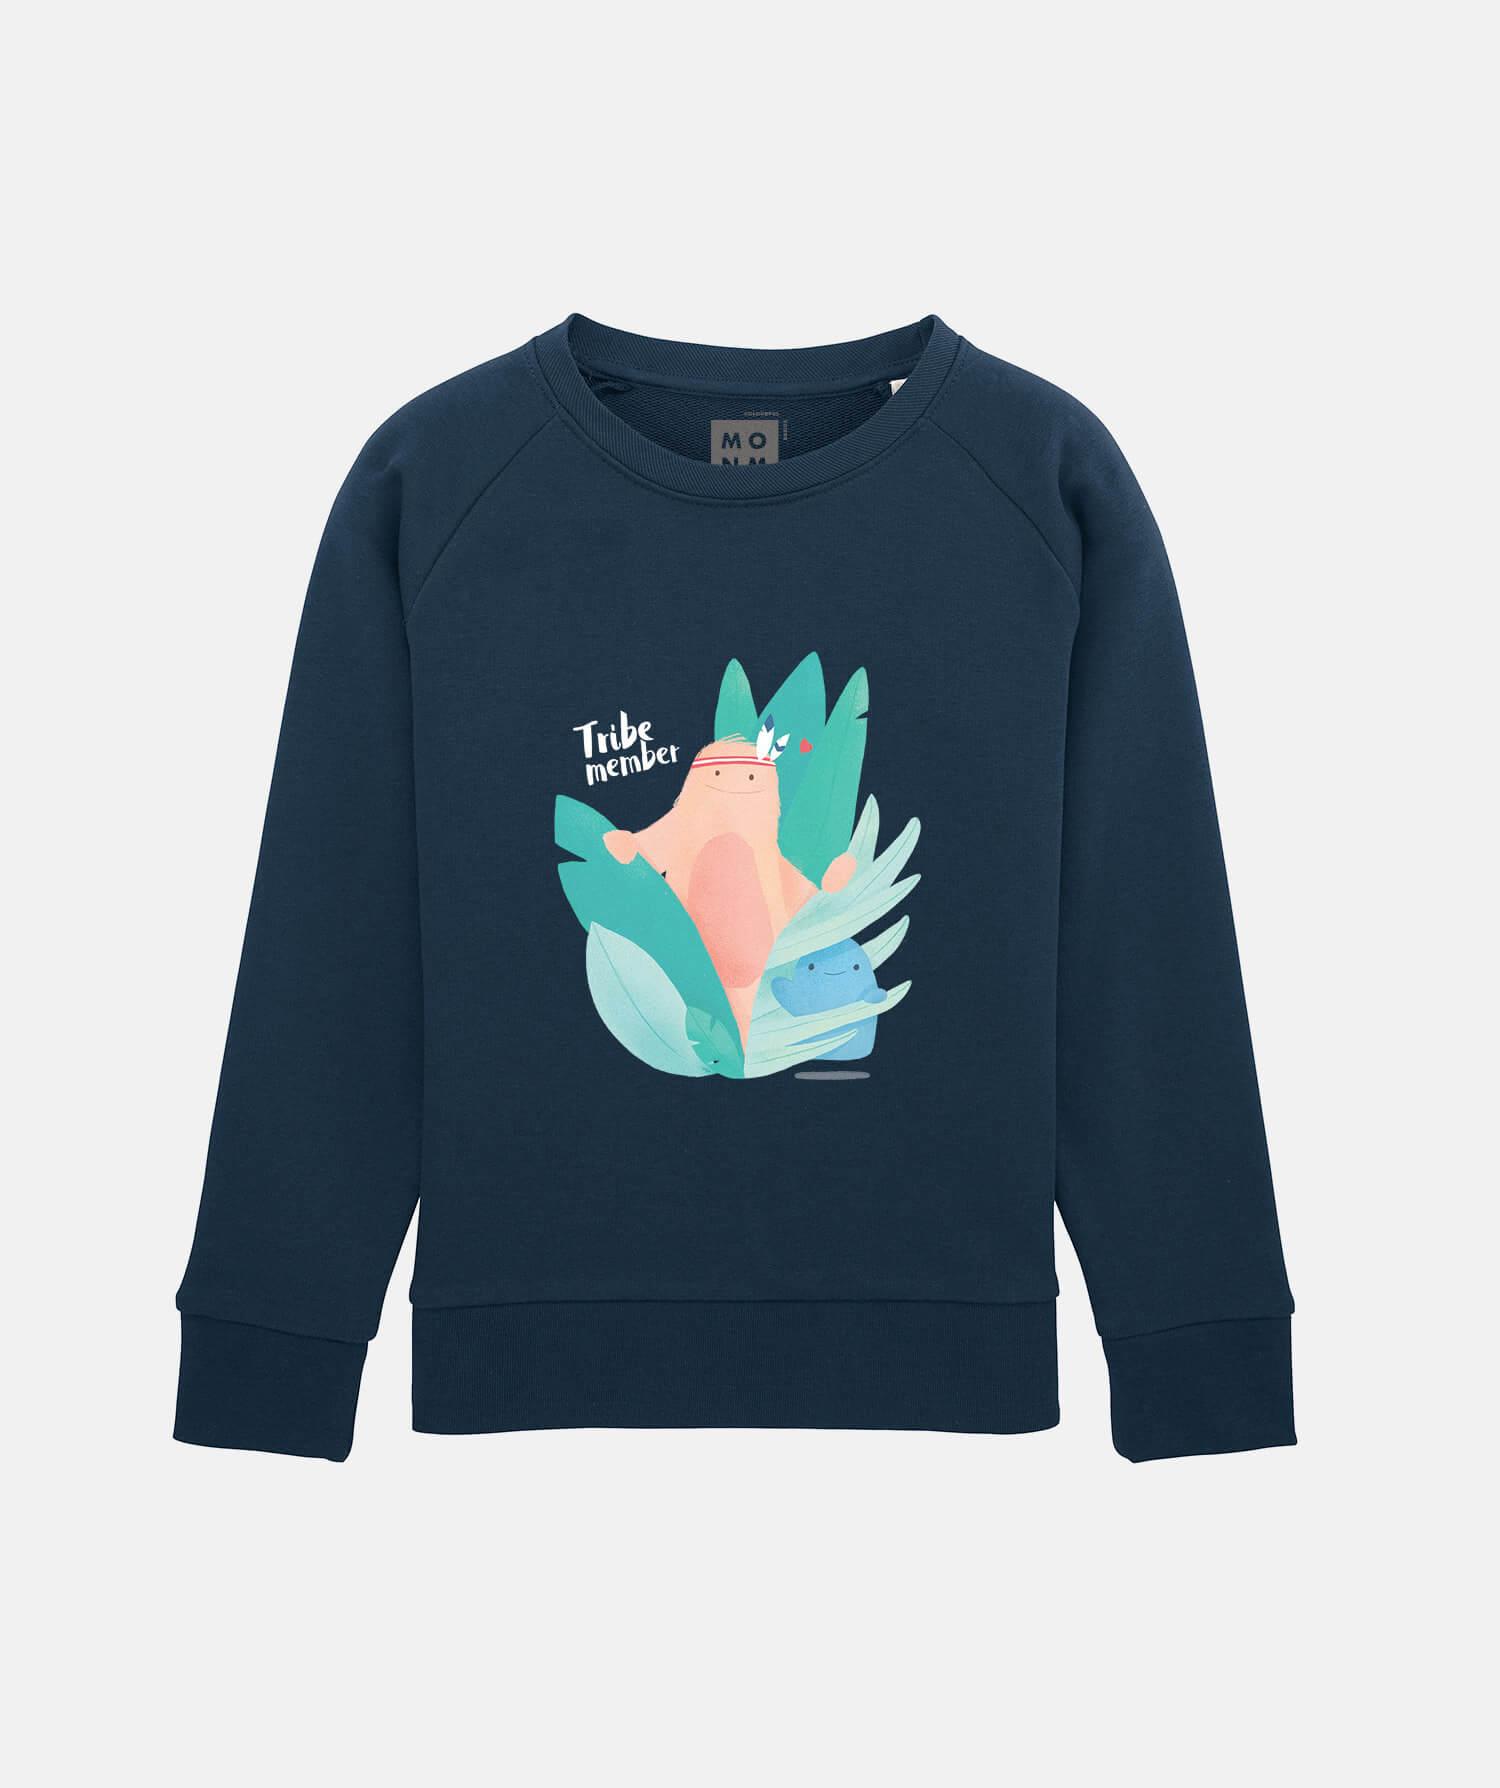 Tribe Member - kids (twinning sweater)